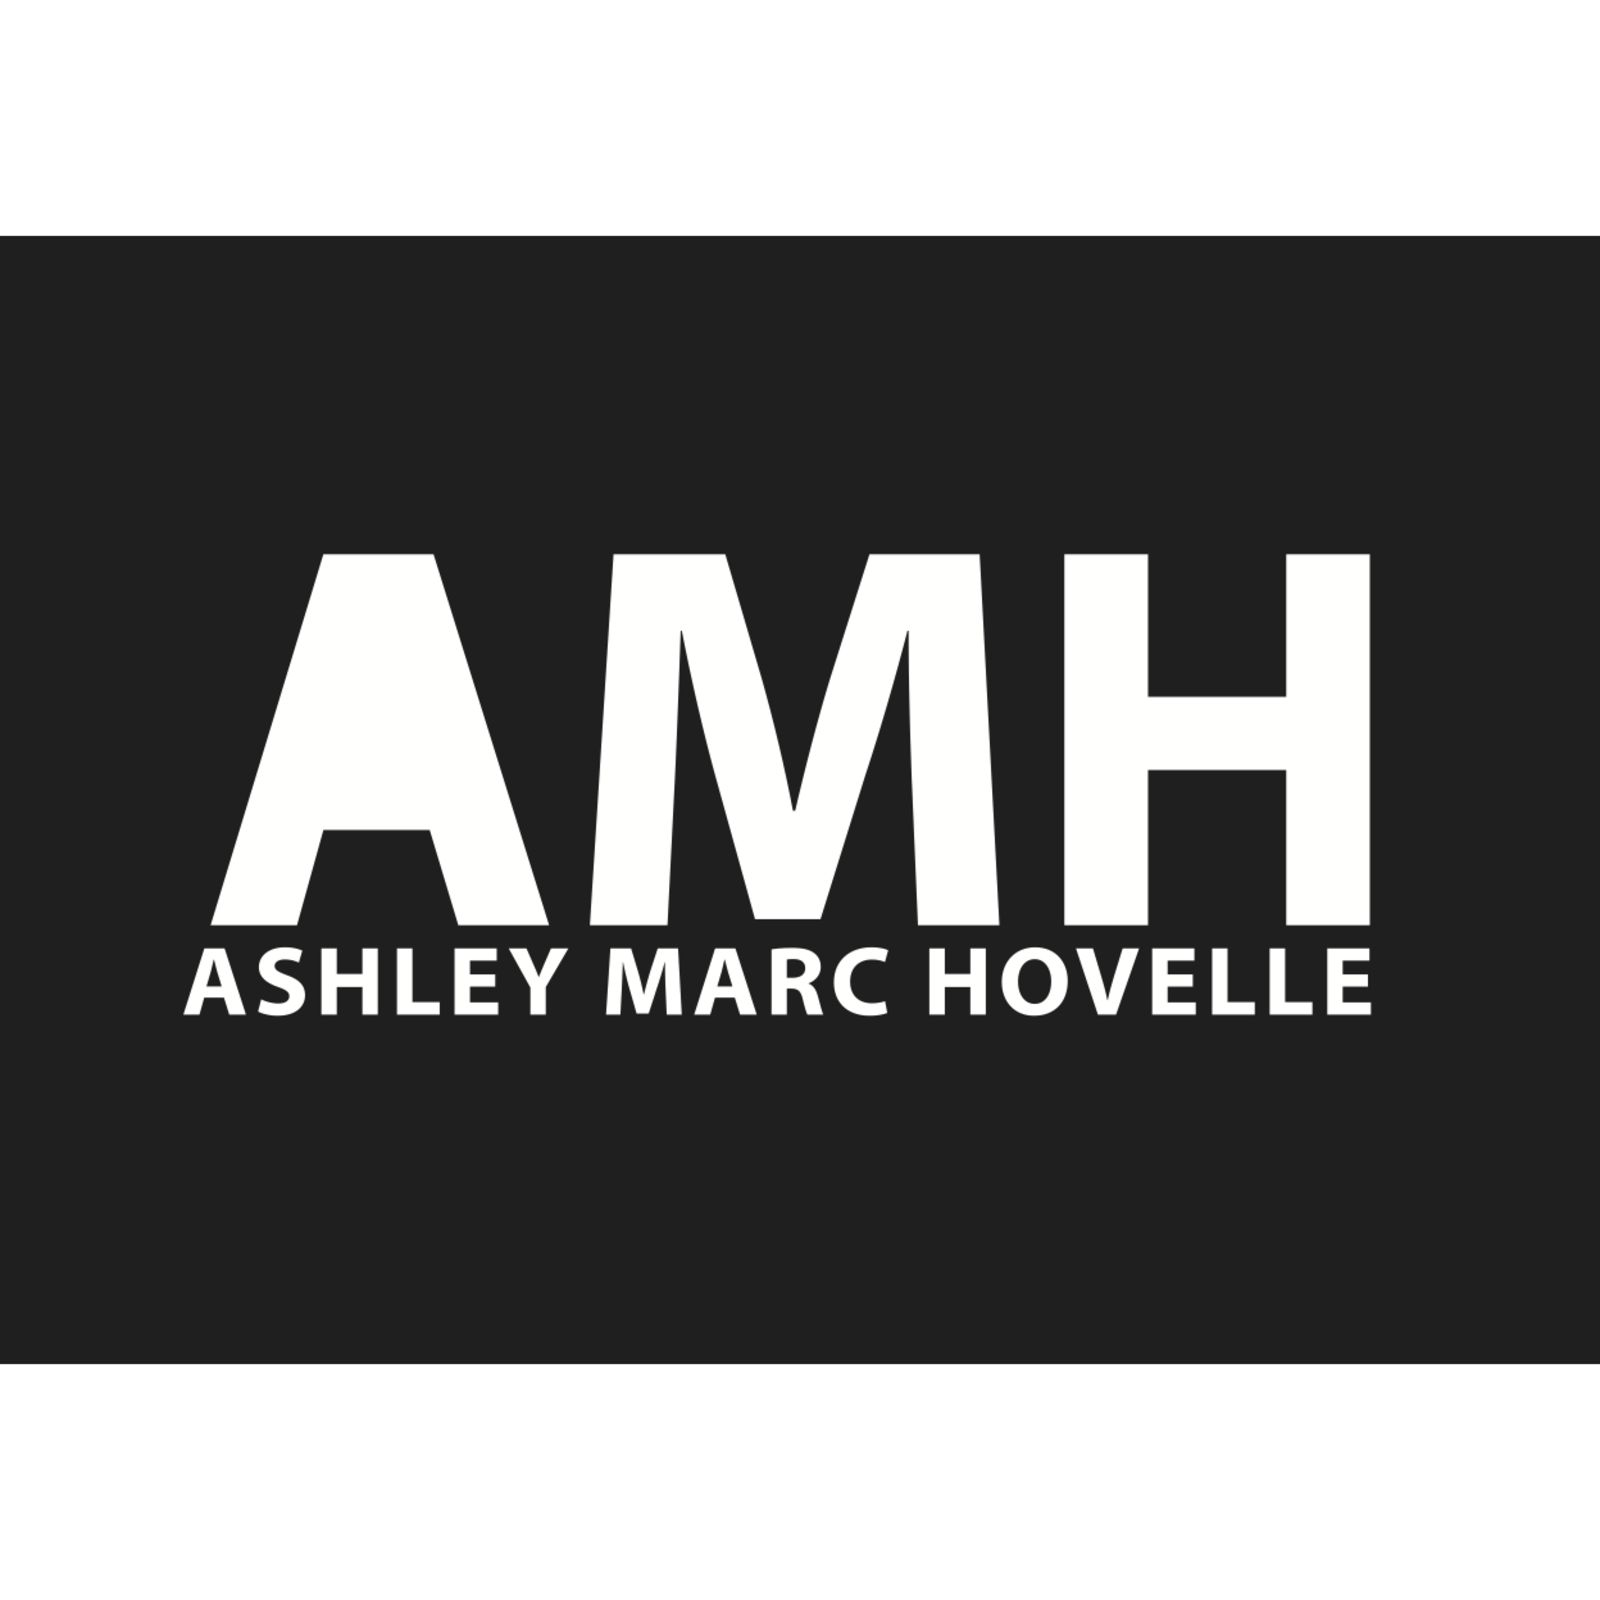 AMH ASHLEY MARC HOVELLE (Bild 1)